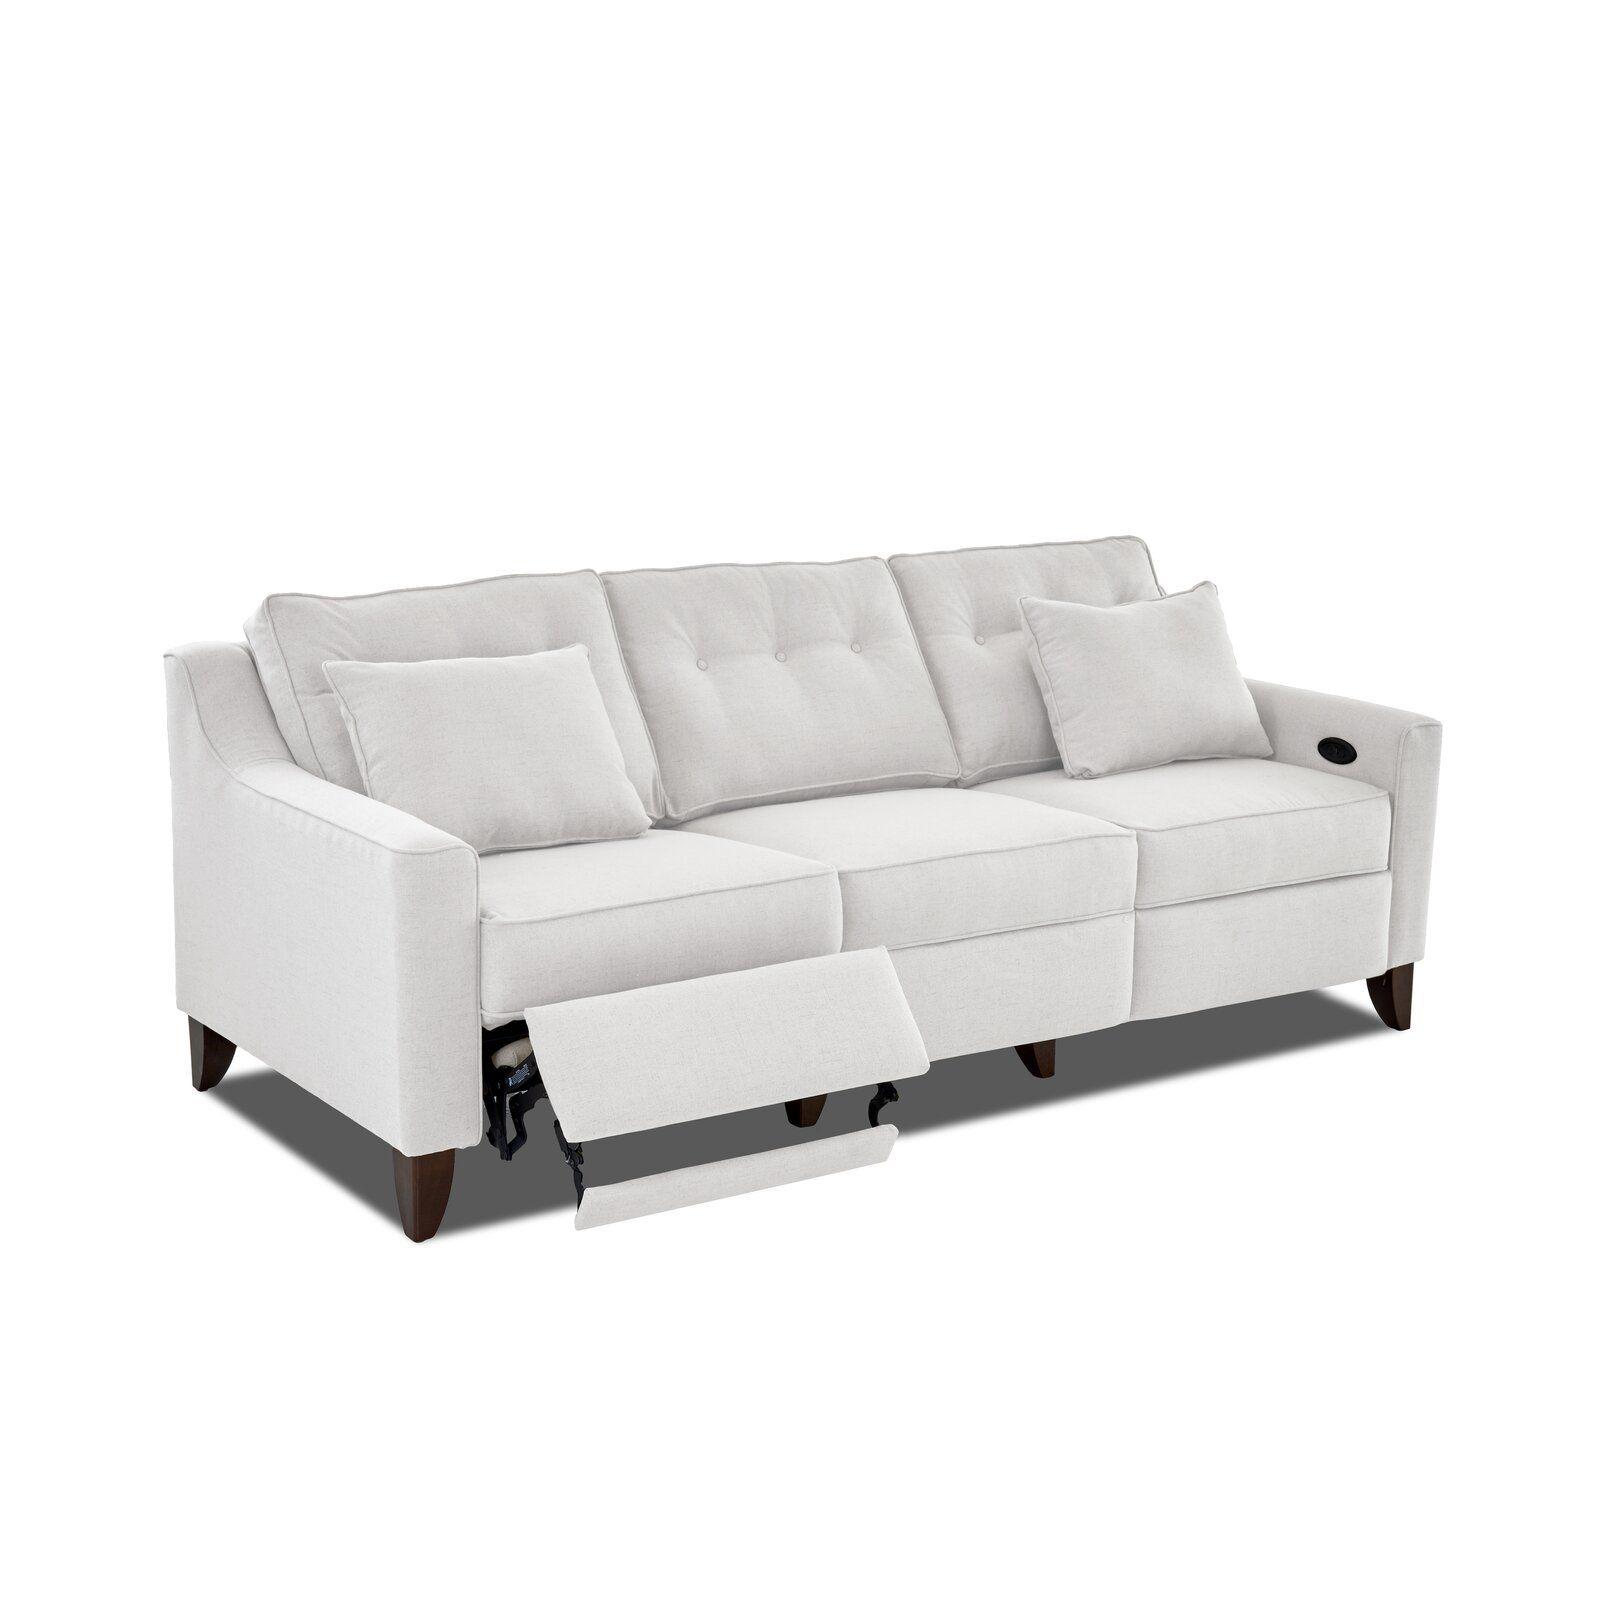 Logan Reclining Sofa Leather Reclining Sofa Reclining Sofa Reclining Sofa Living Room